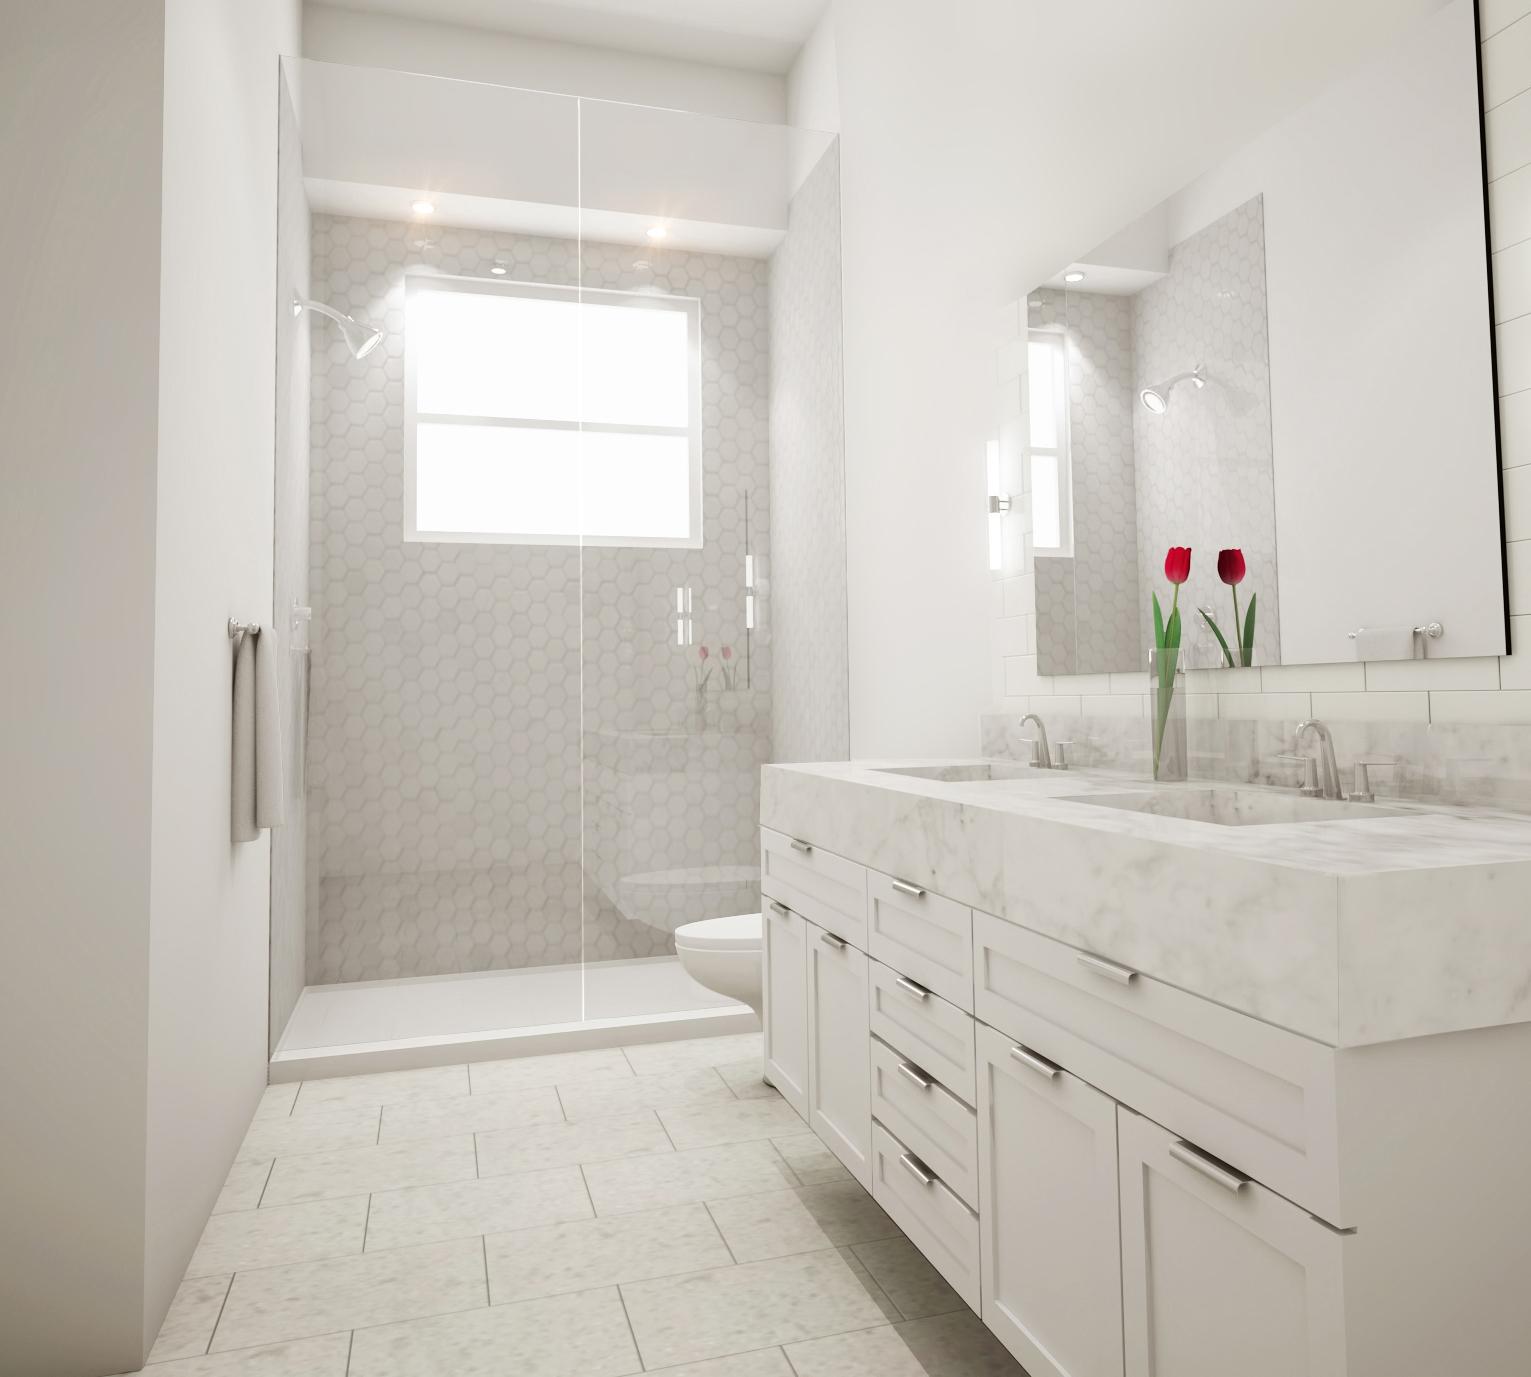 Washroom_View2-Cropped-2.jpg